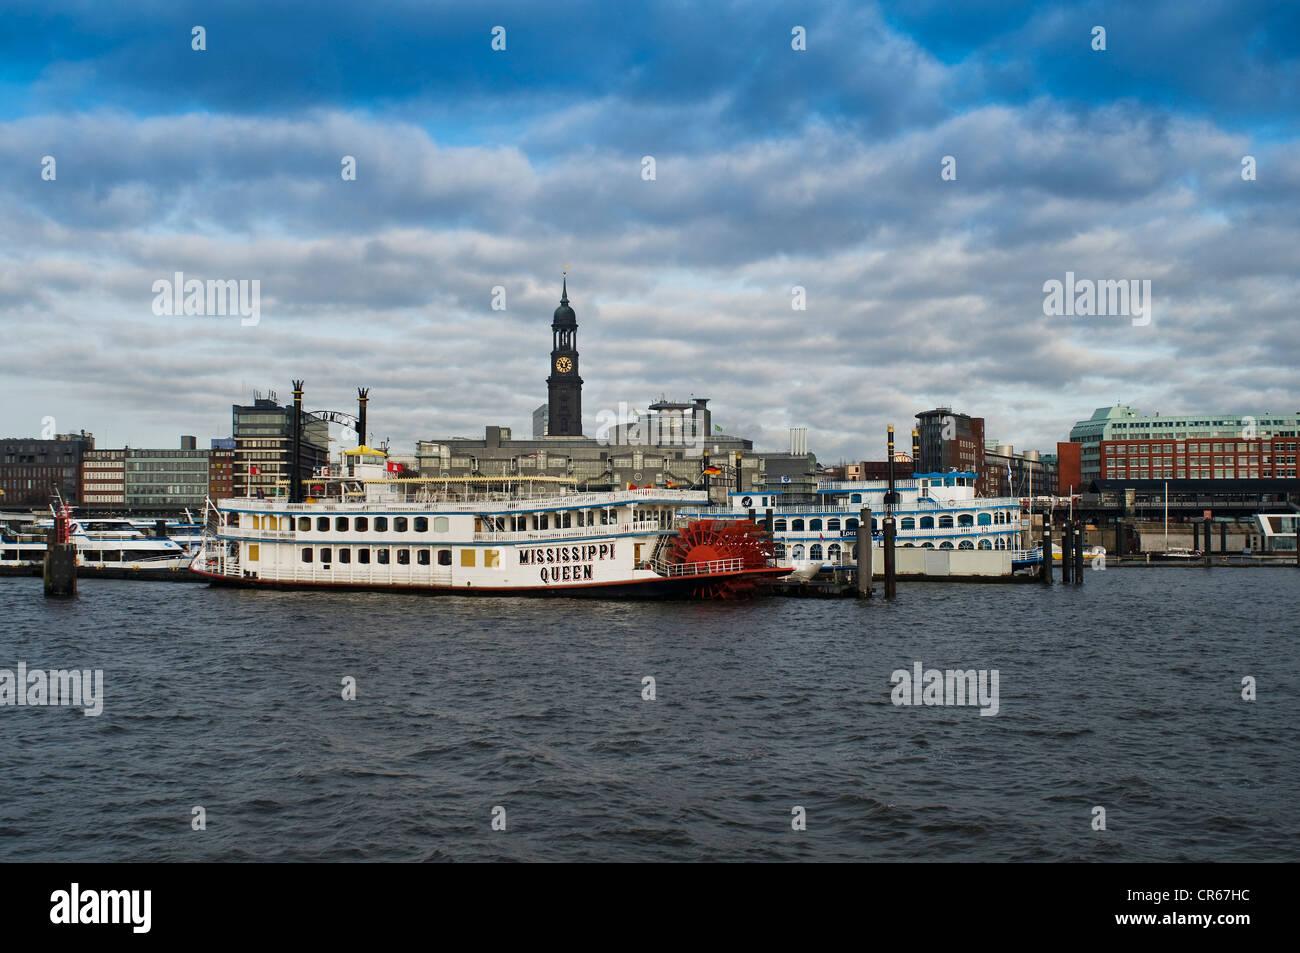 Mississippi Queen paddle wheeler, Port of Hamburg, St. Michaelis Church behind, Hamburg, Germany, Europe - Stock Image